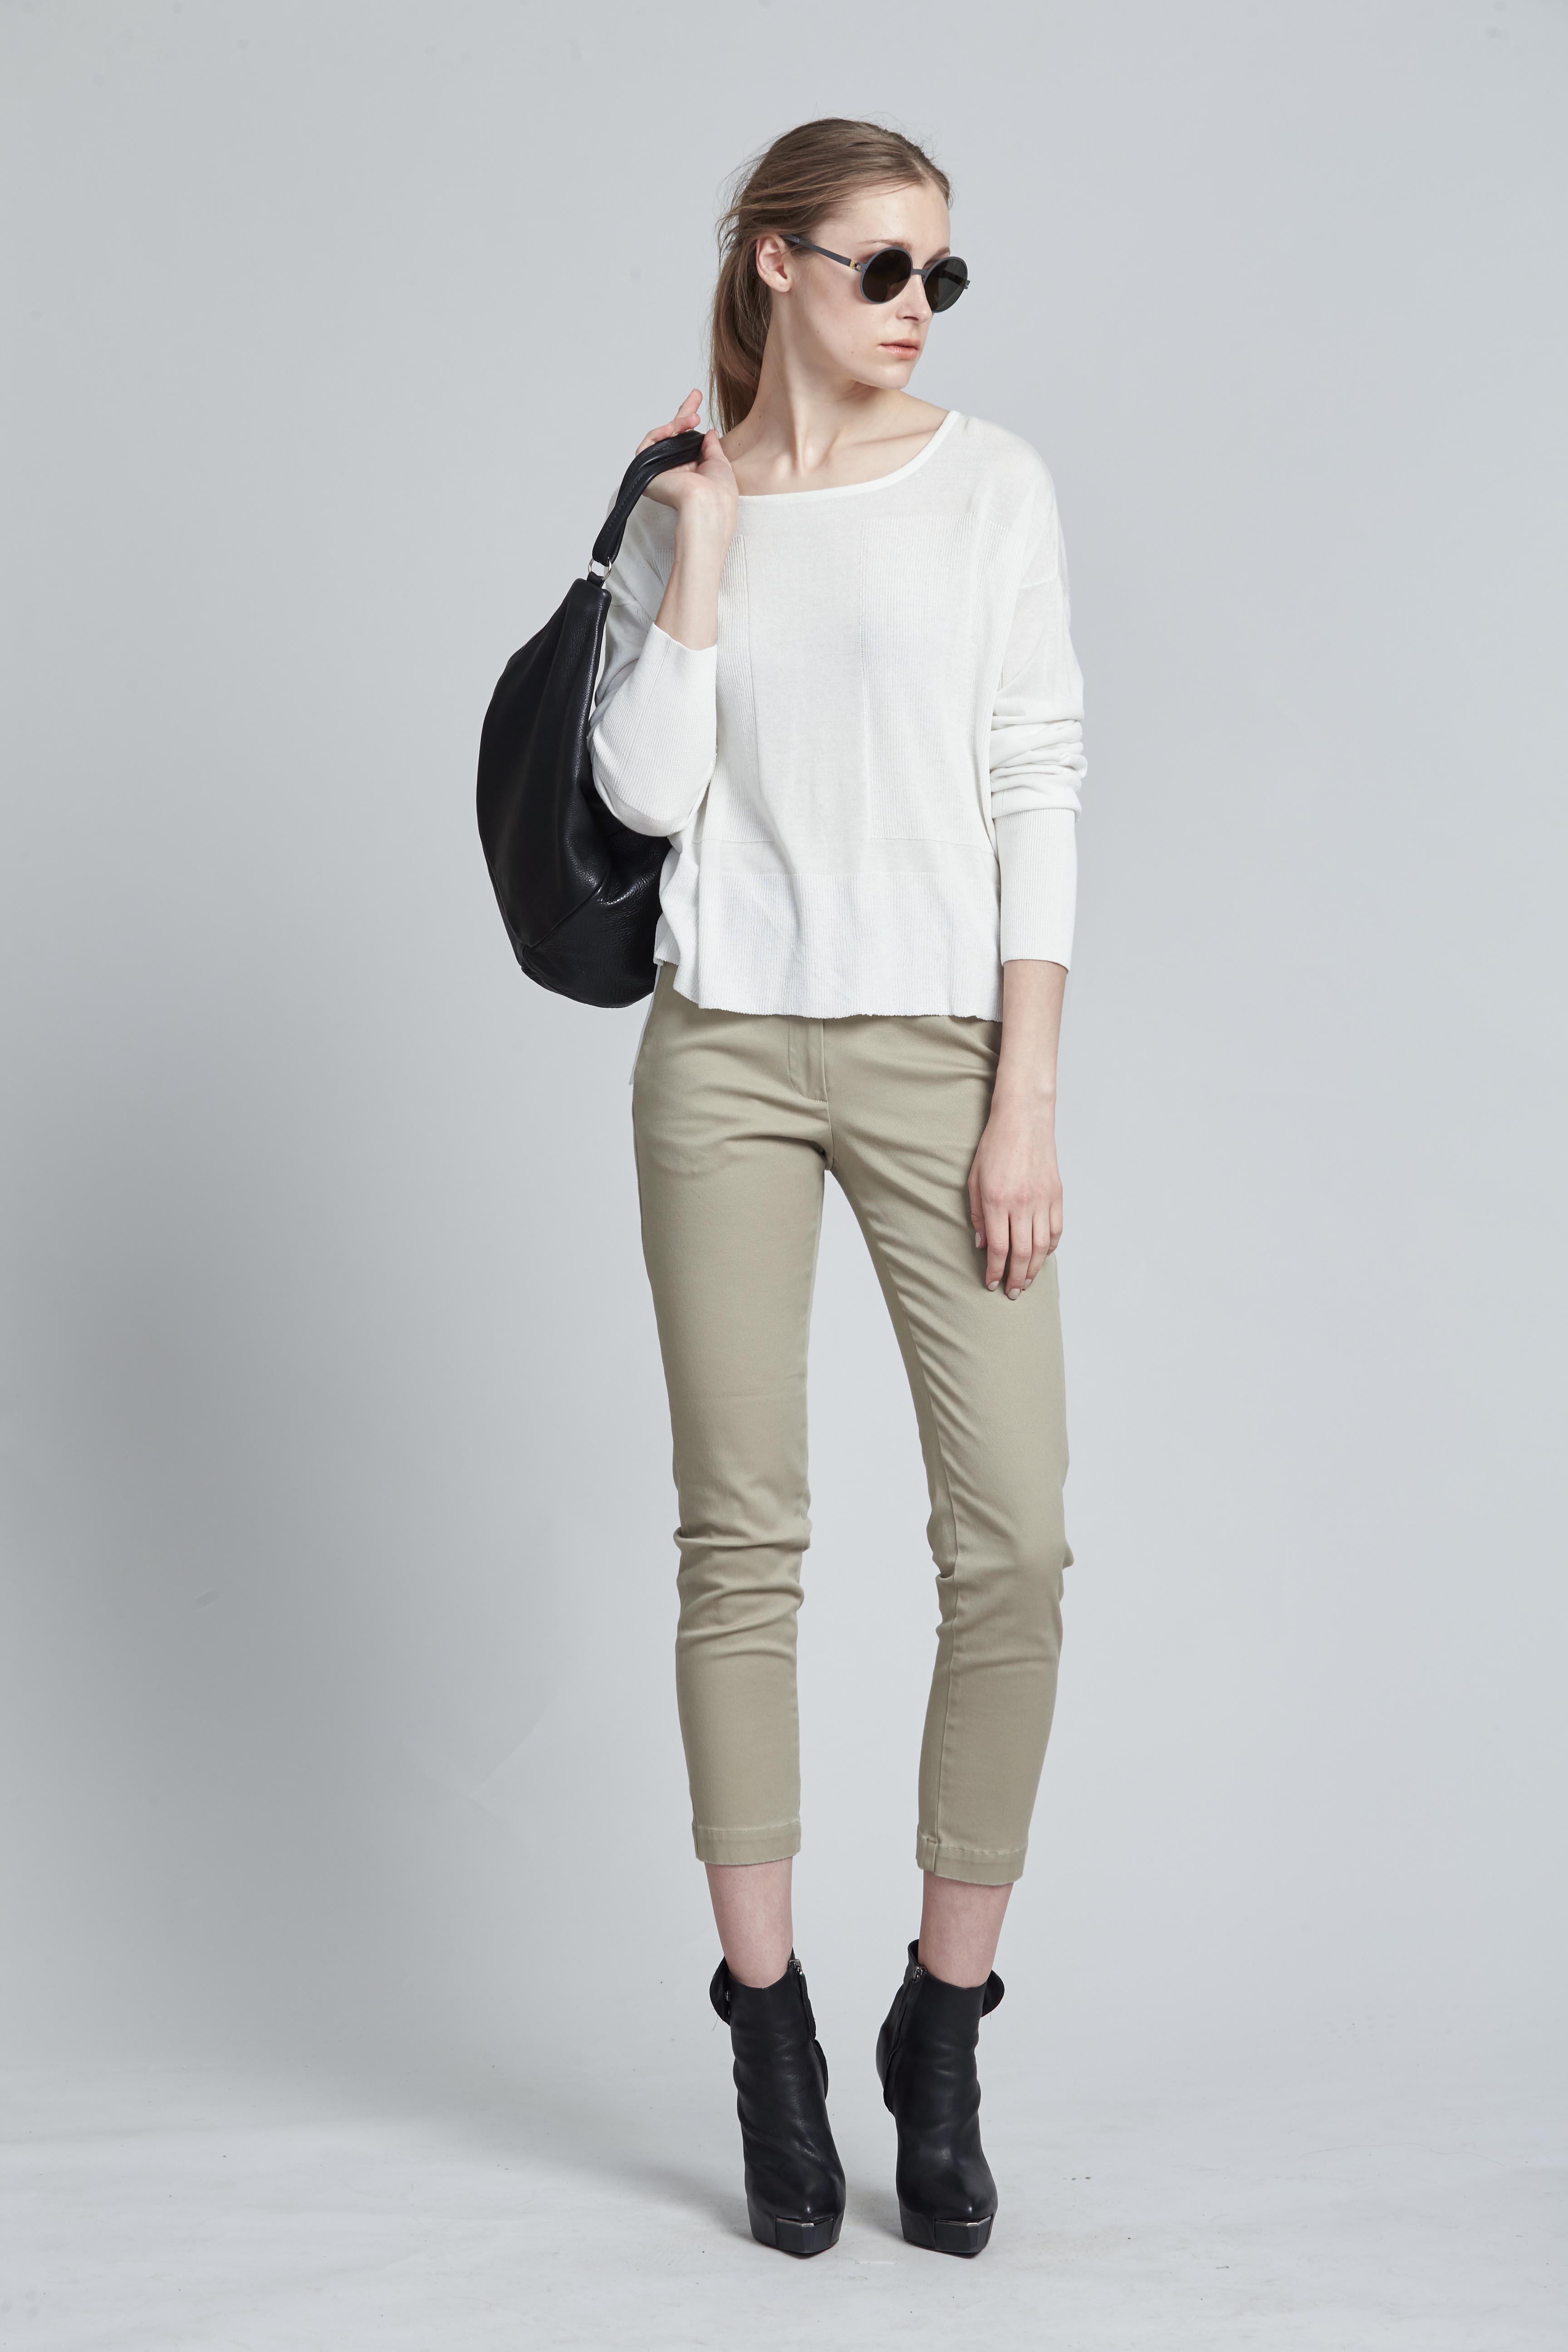 Associate Sweater Alabaster, Fixture Jean Sand, Assembly Bag 3 taylorS15-1423